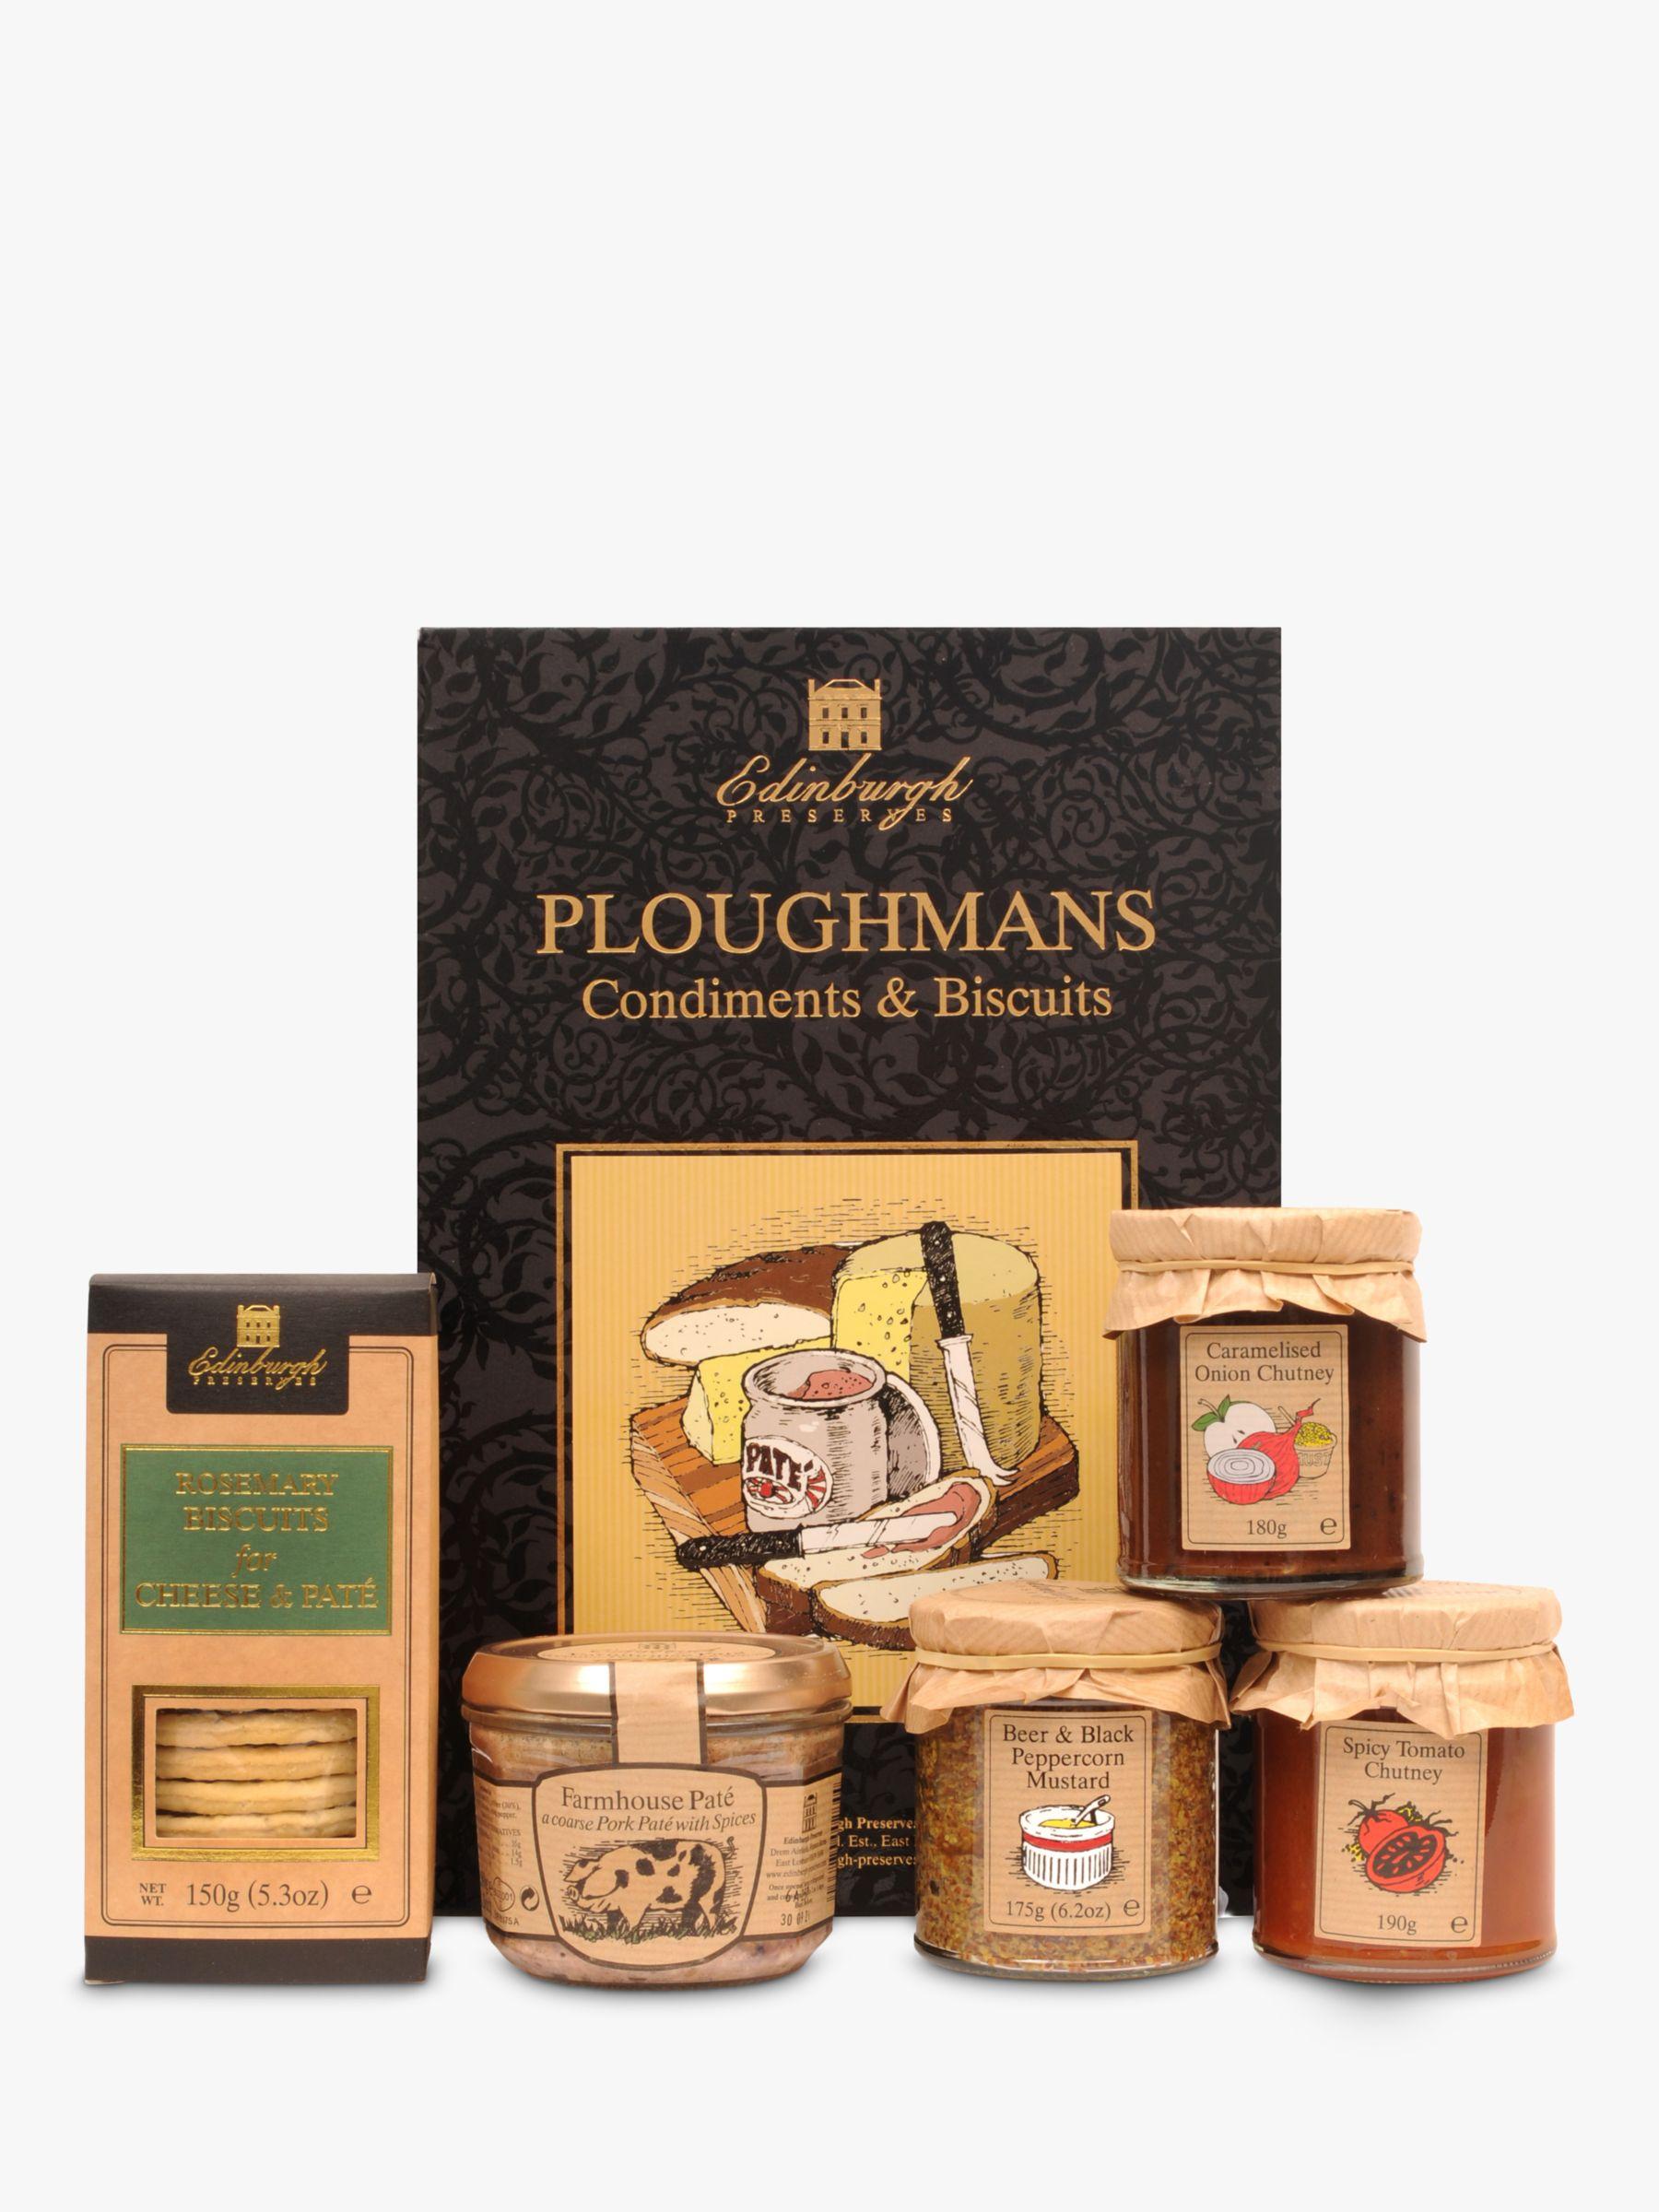 Edinburgh Preserves Edinburgh Preserves Ploughmans Box, 885g